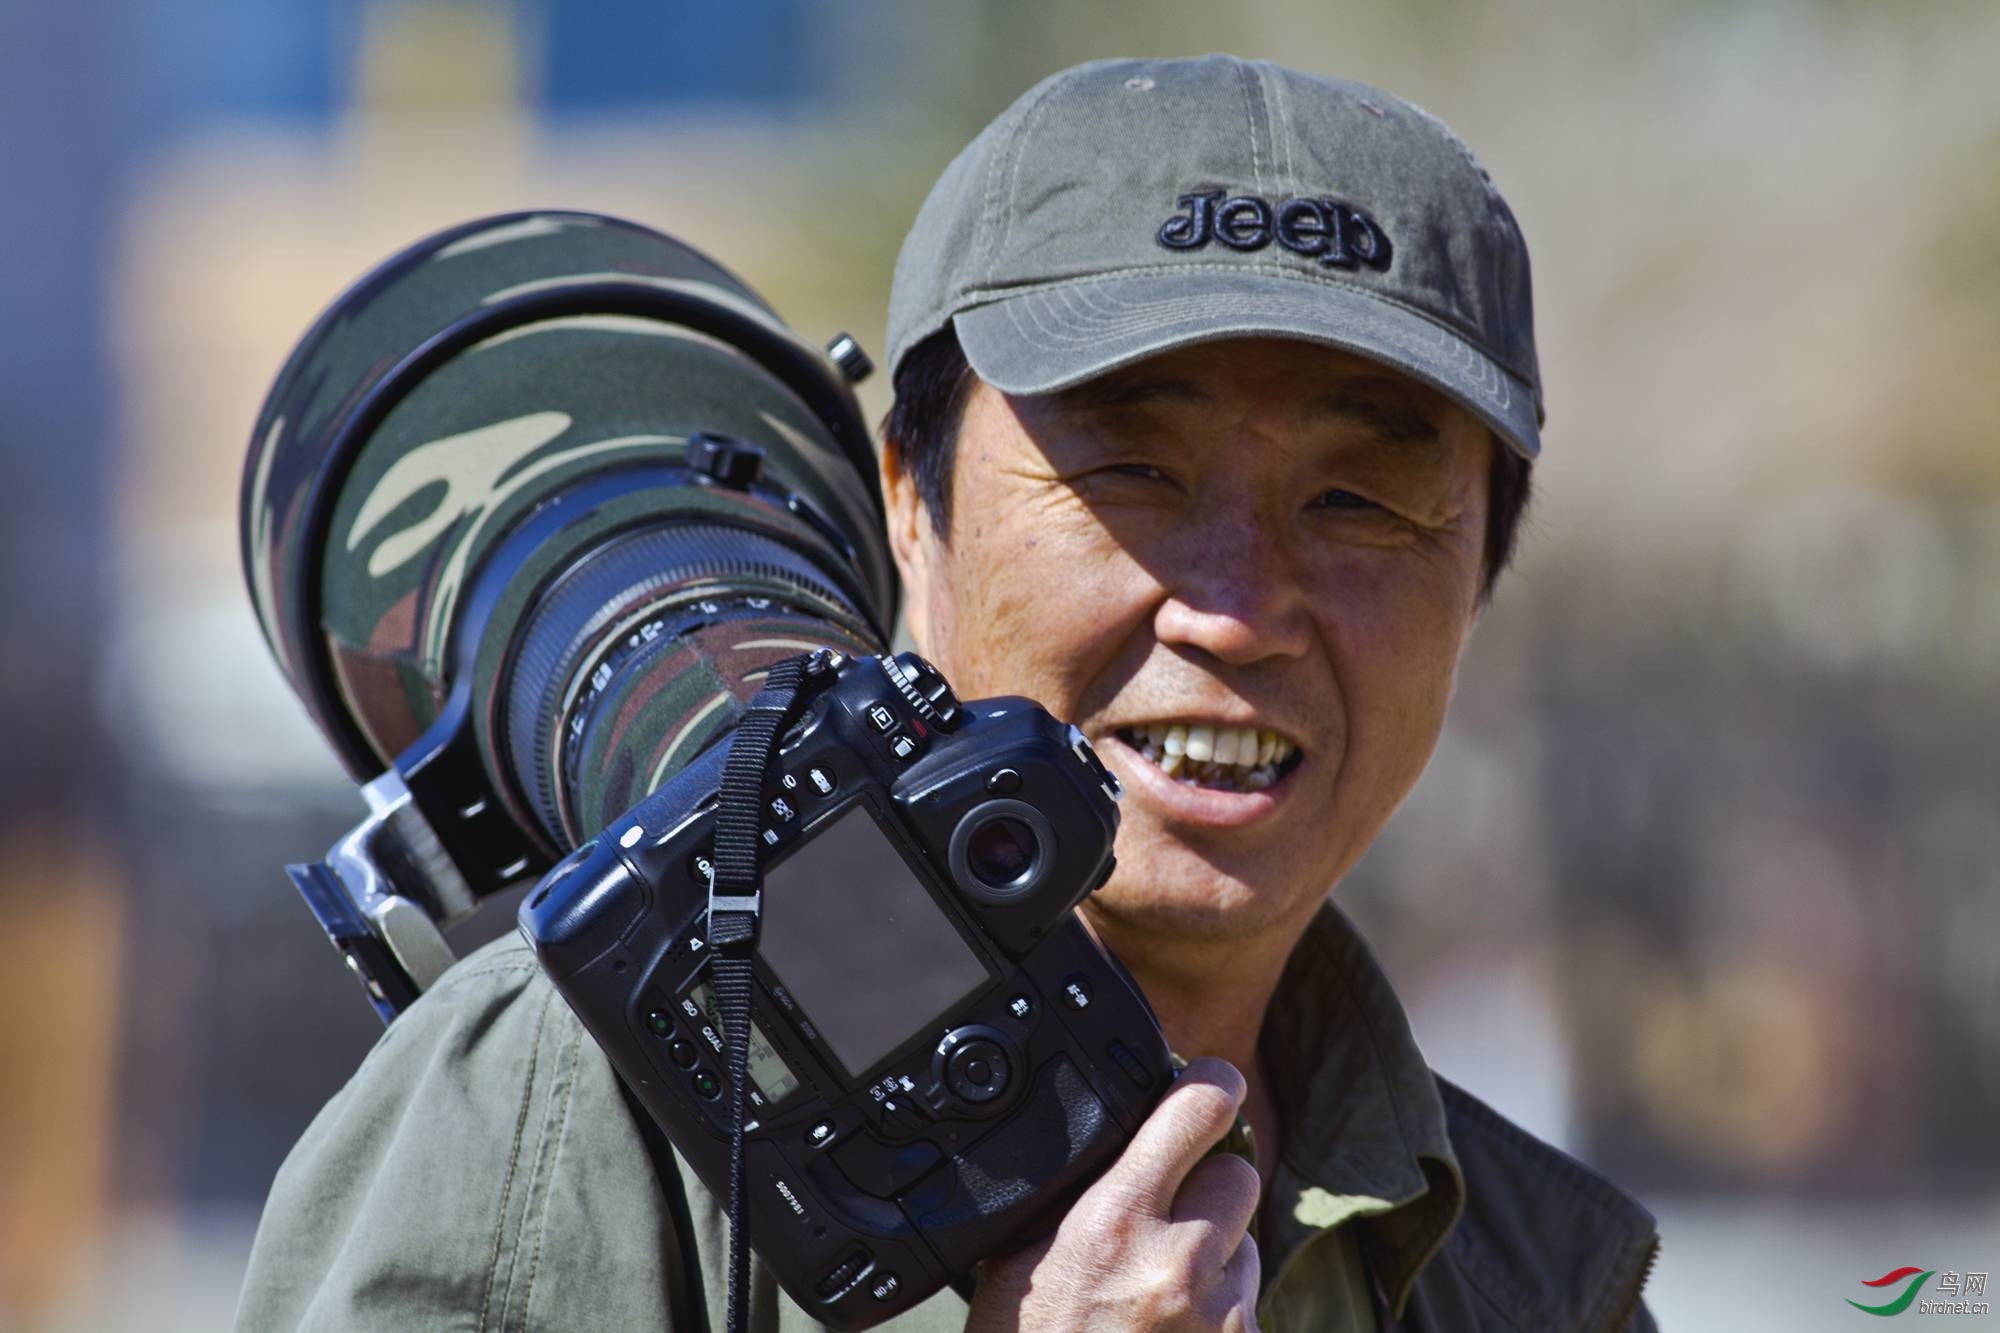 Z 004  天福:回顾野鸟摄影十三年,与鸟网同龄